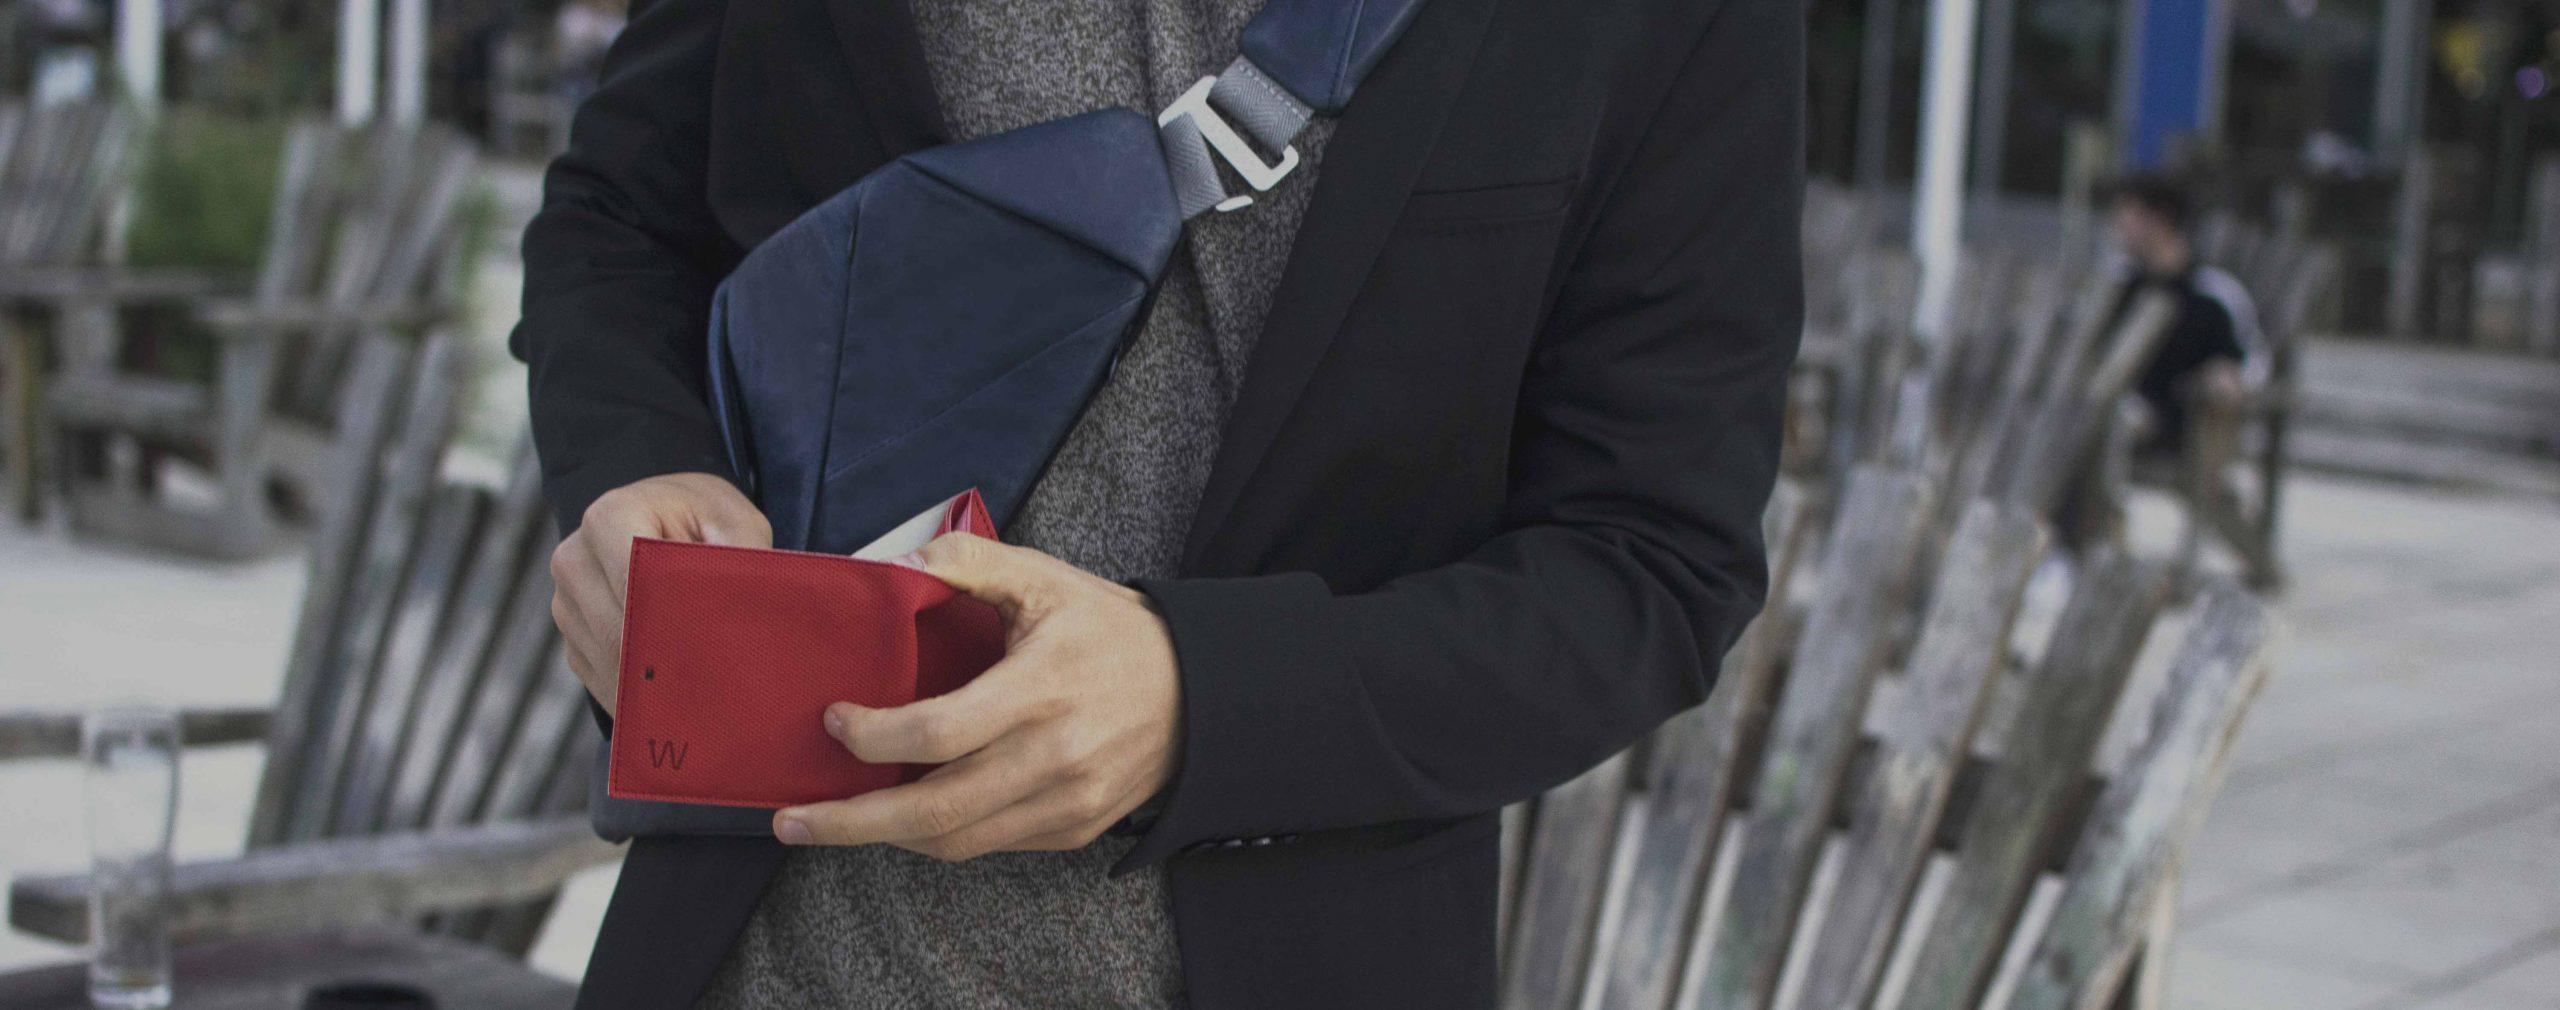 Man holding a smart wallet